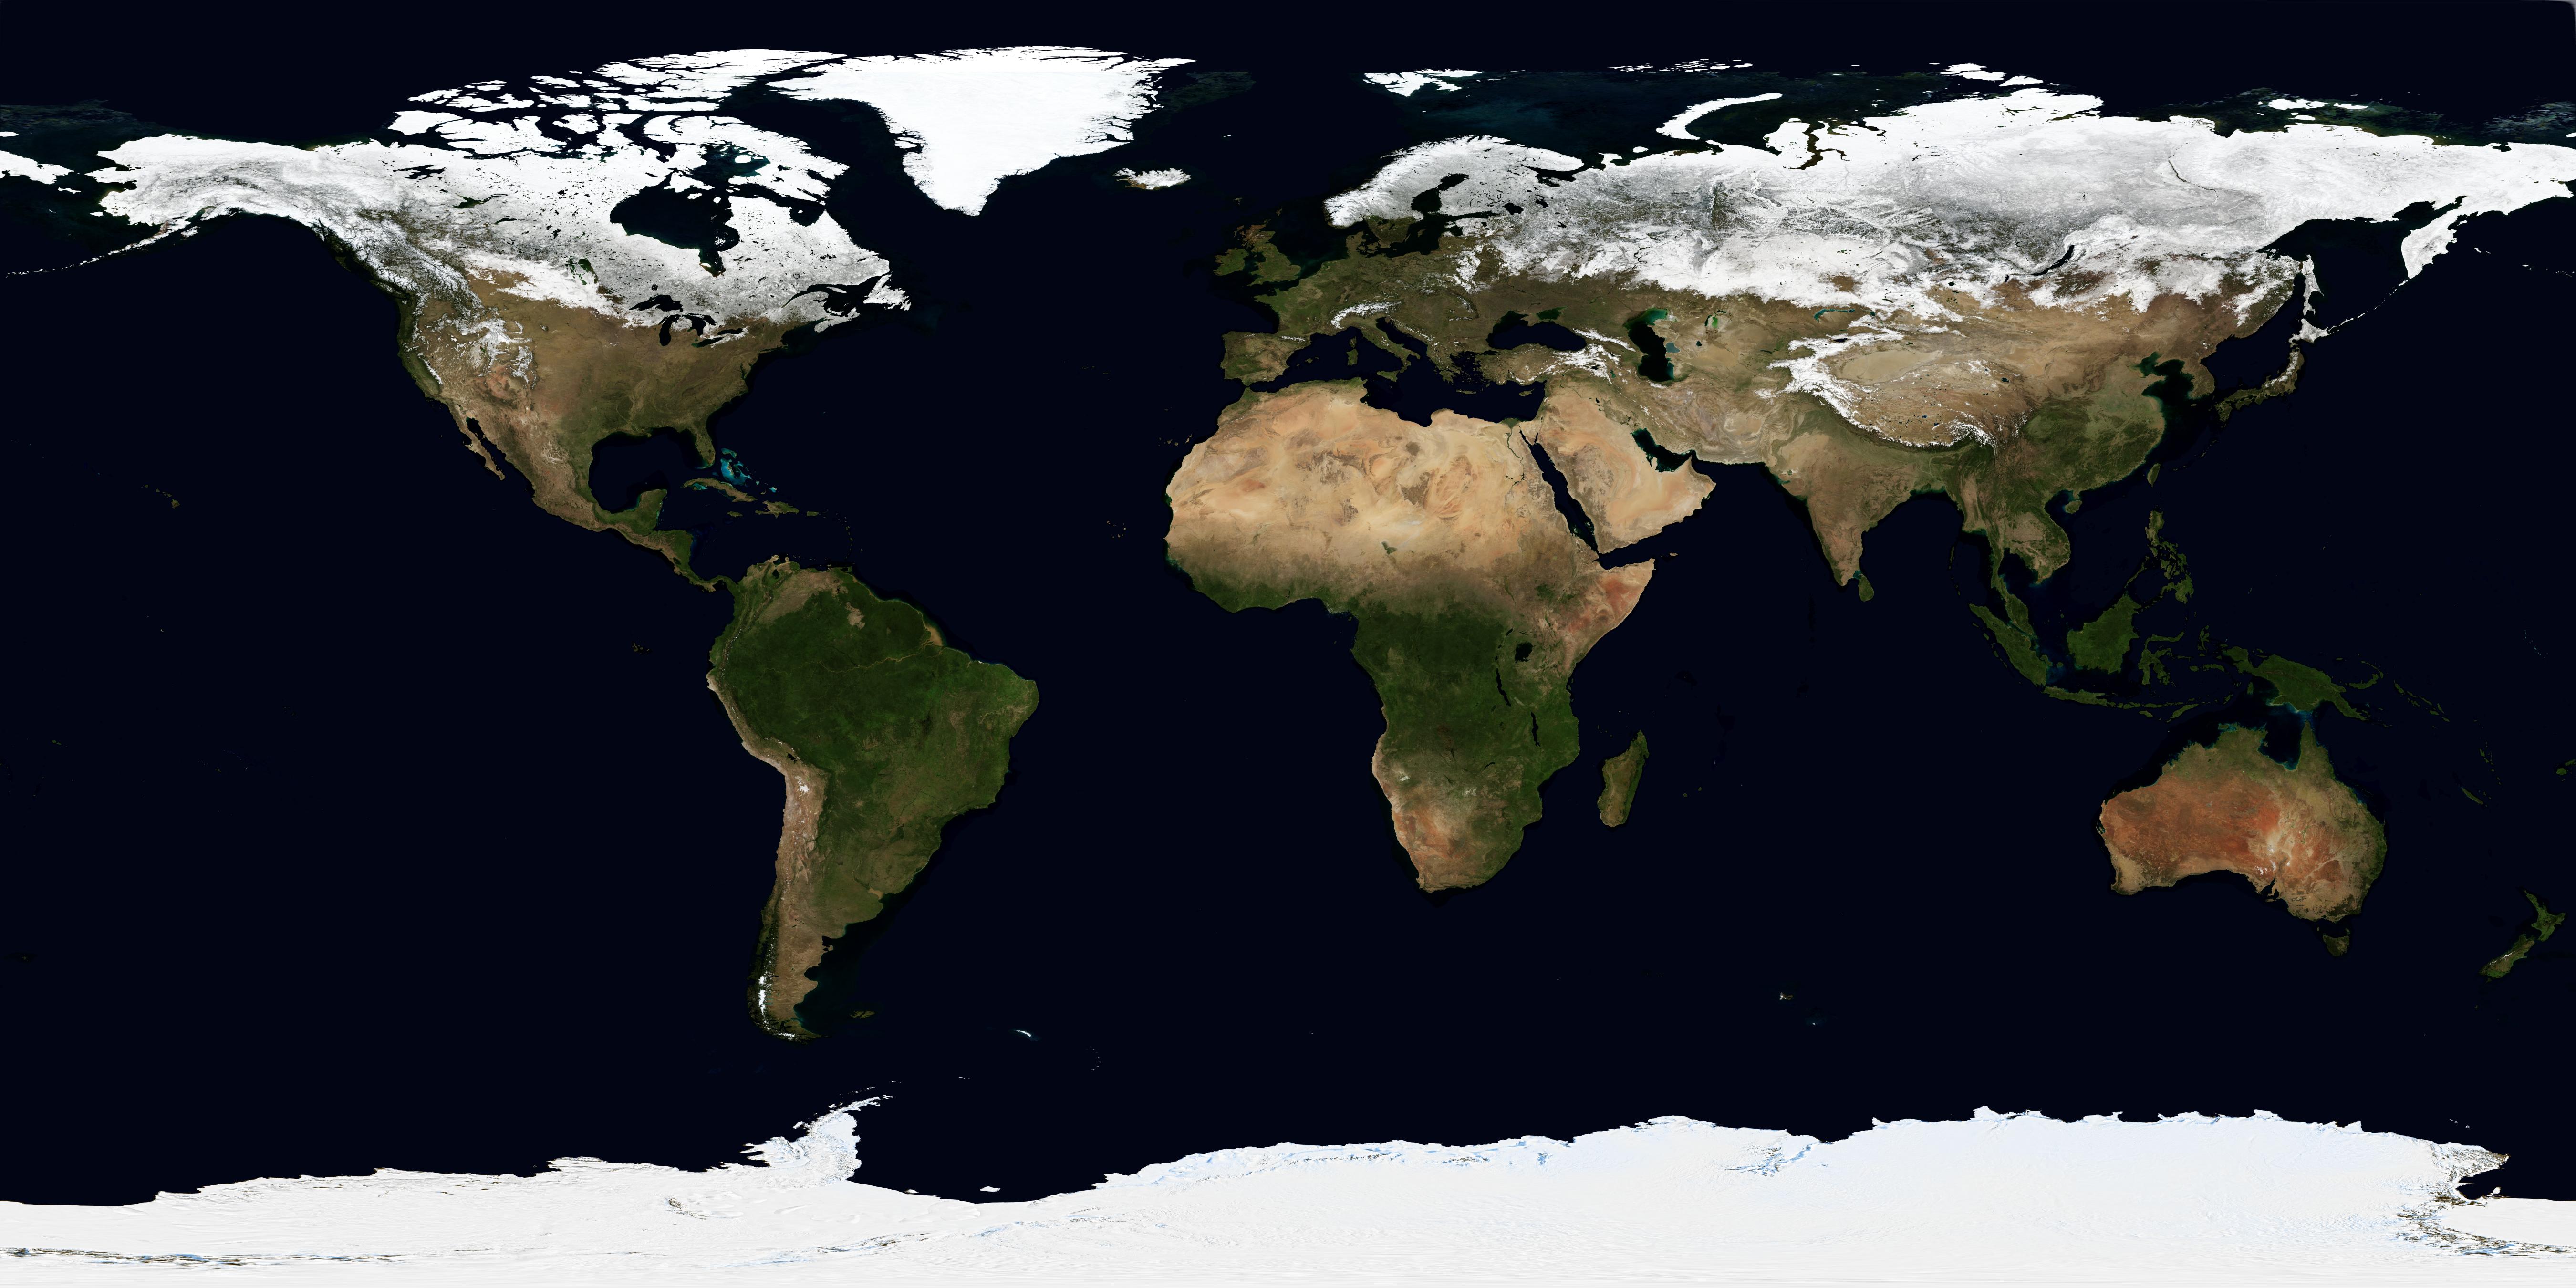 NASA Visible Earth: March, Blue Marble Next Generation.